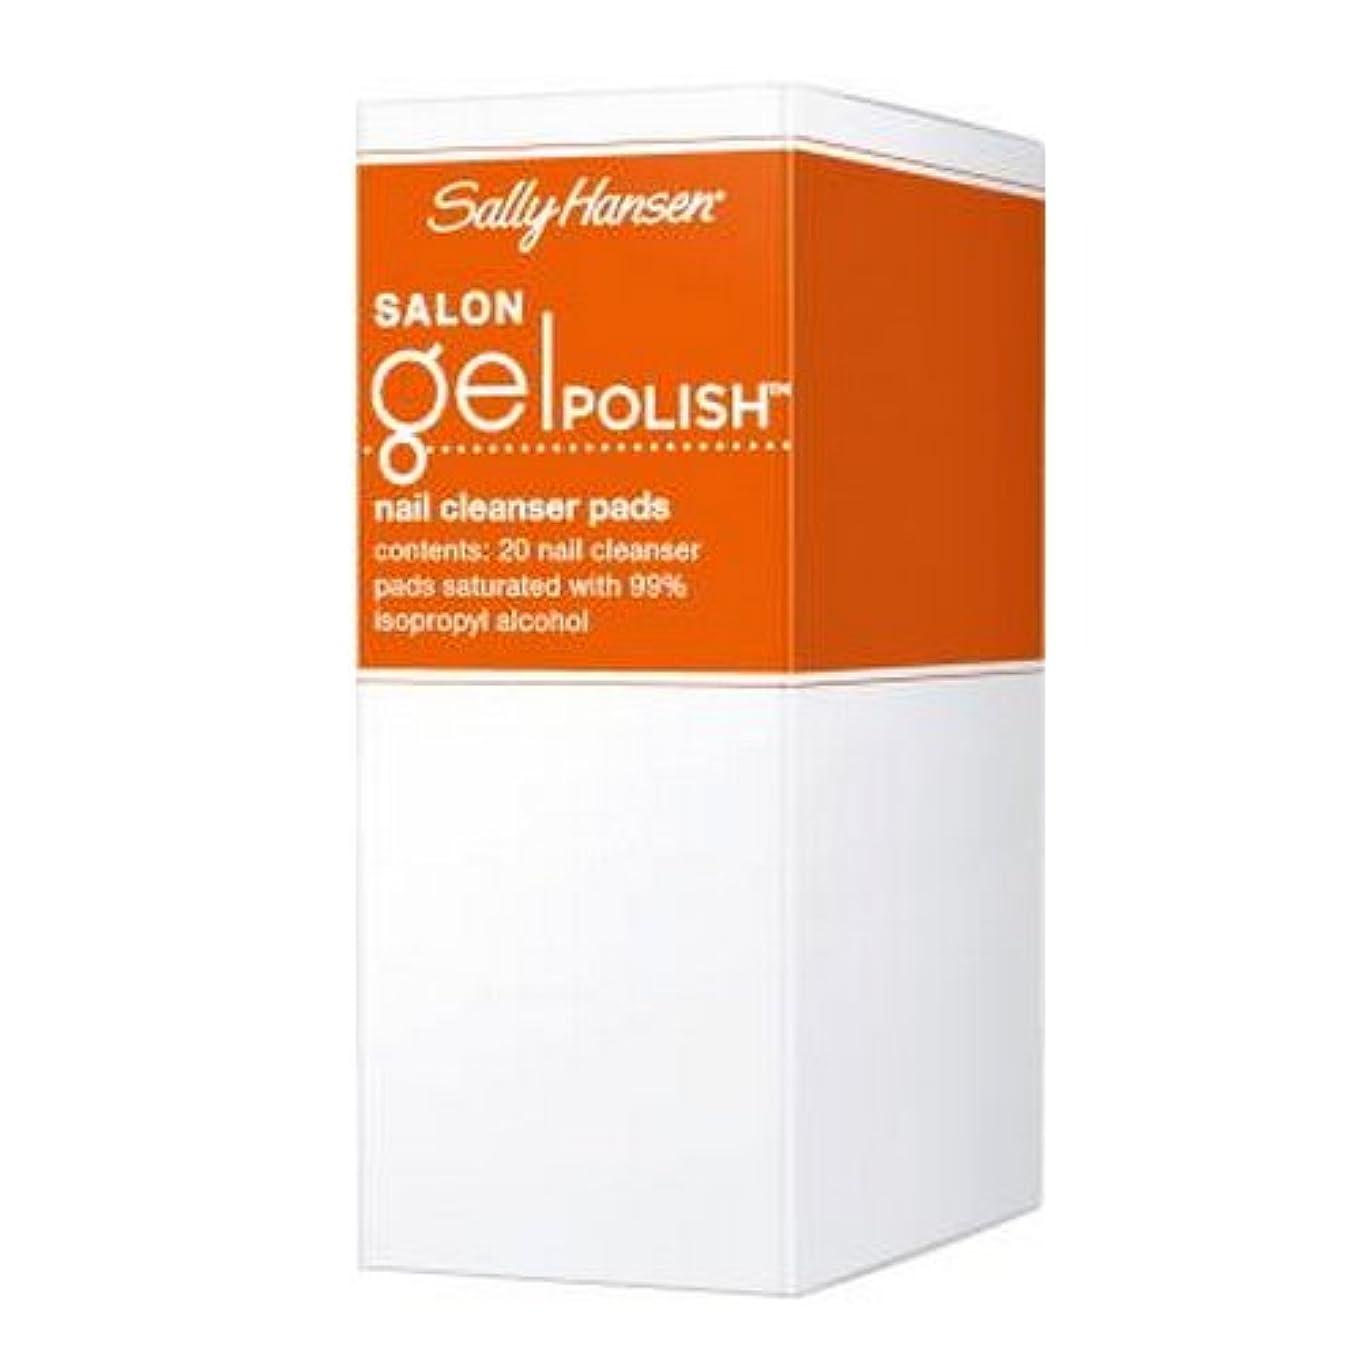 SALLY HANSEN Salon Gel Polish Nail Cleanser Pads - Gel Polish Cleanser Pads (並行輸入品)